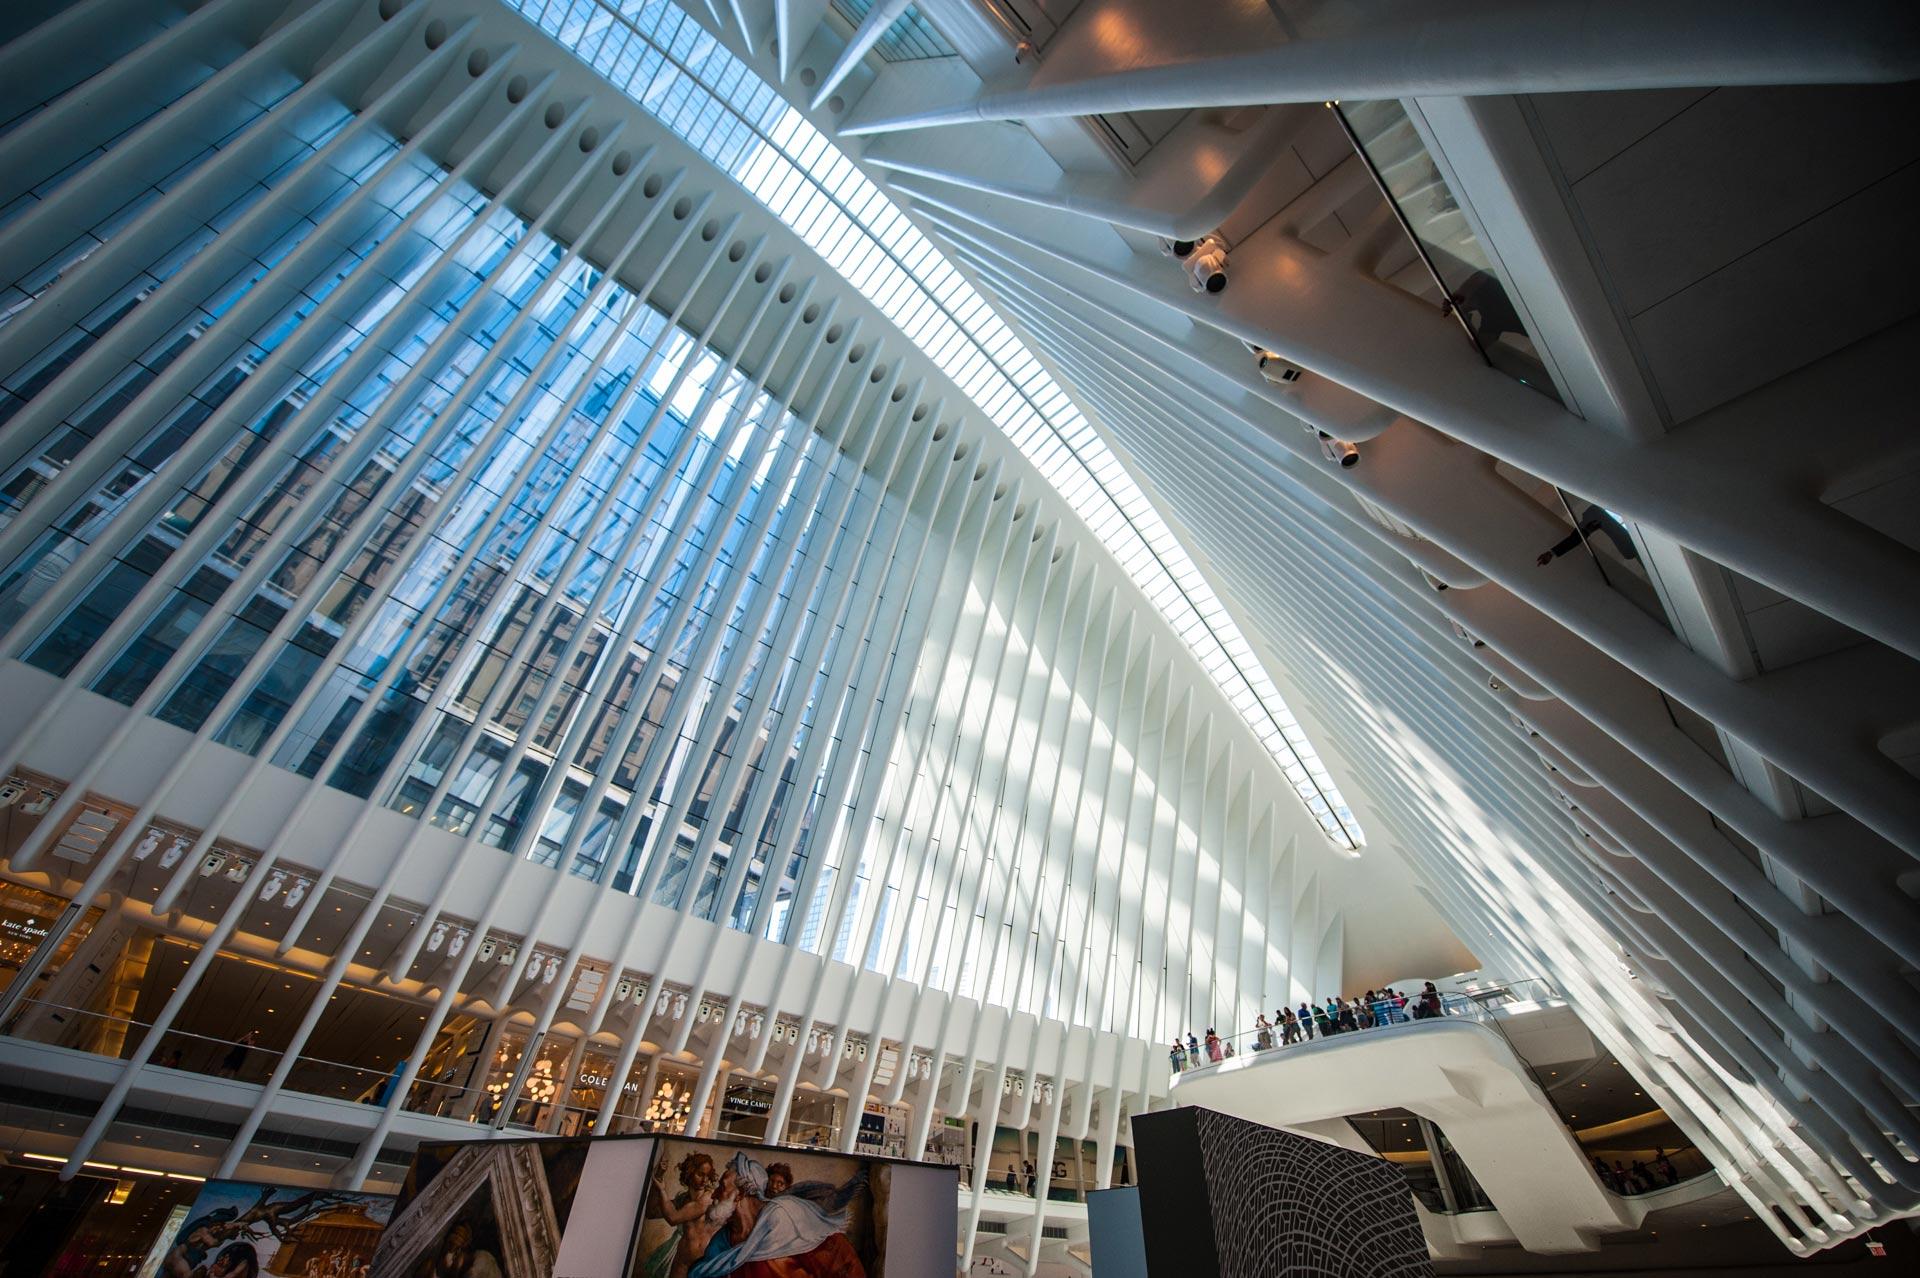 Inside of the World Trade Center station (PATH), World Trade Center, New York, NY, USA